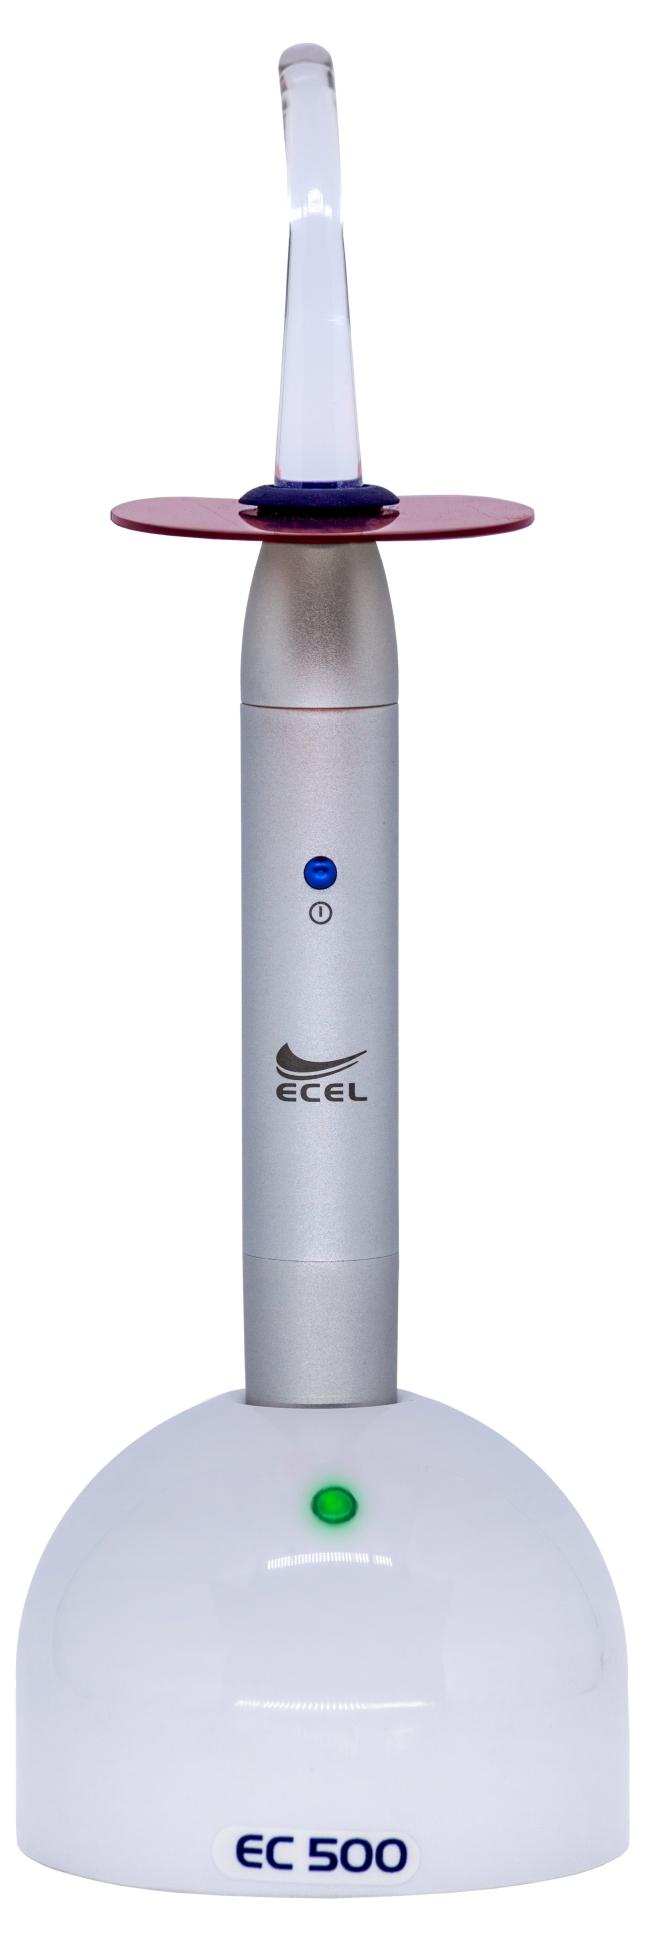 Fotopolimerizador e Clareador - EC500 ECEL